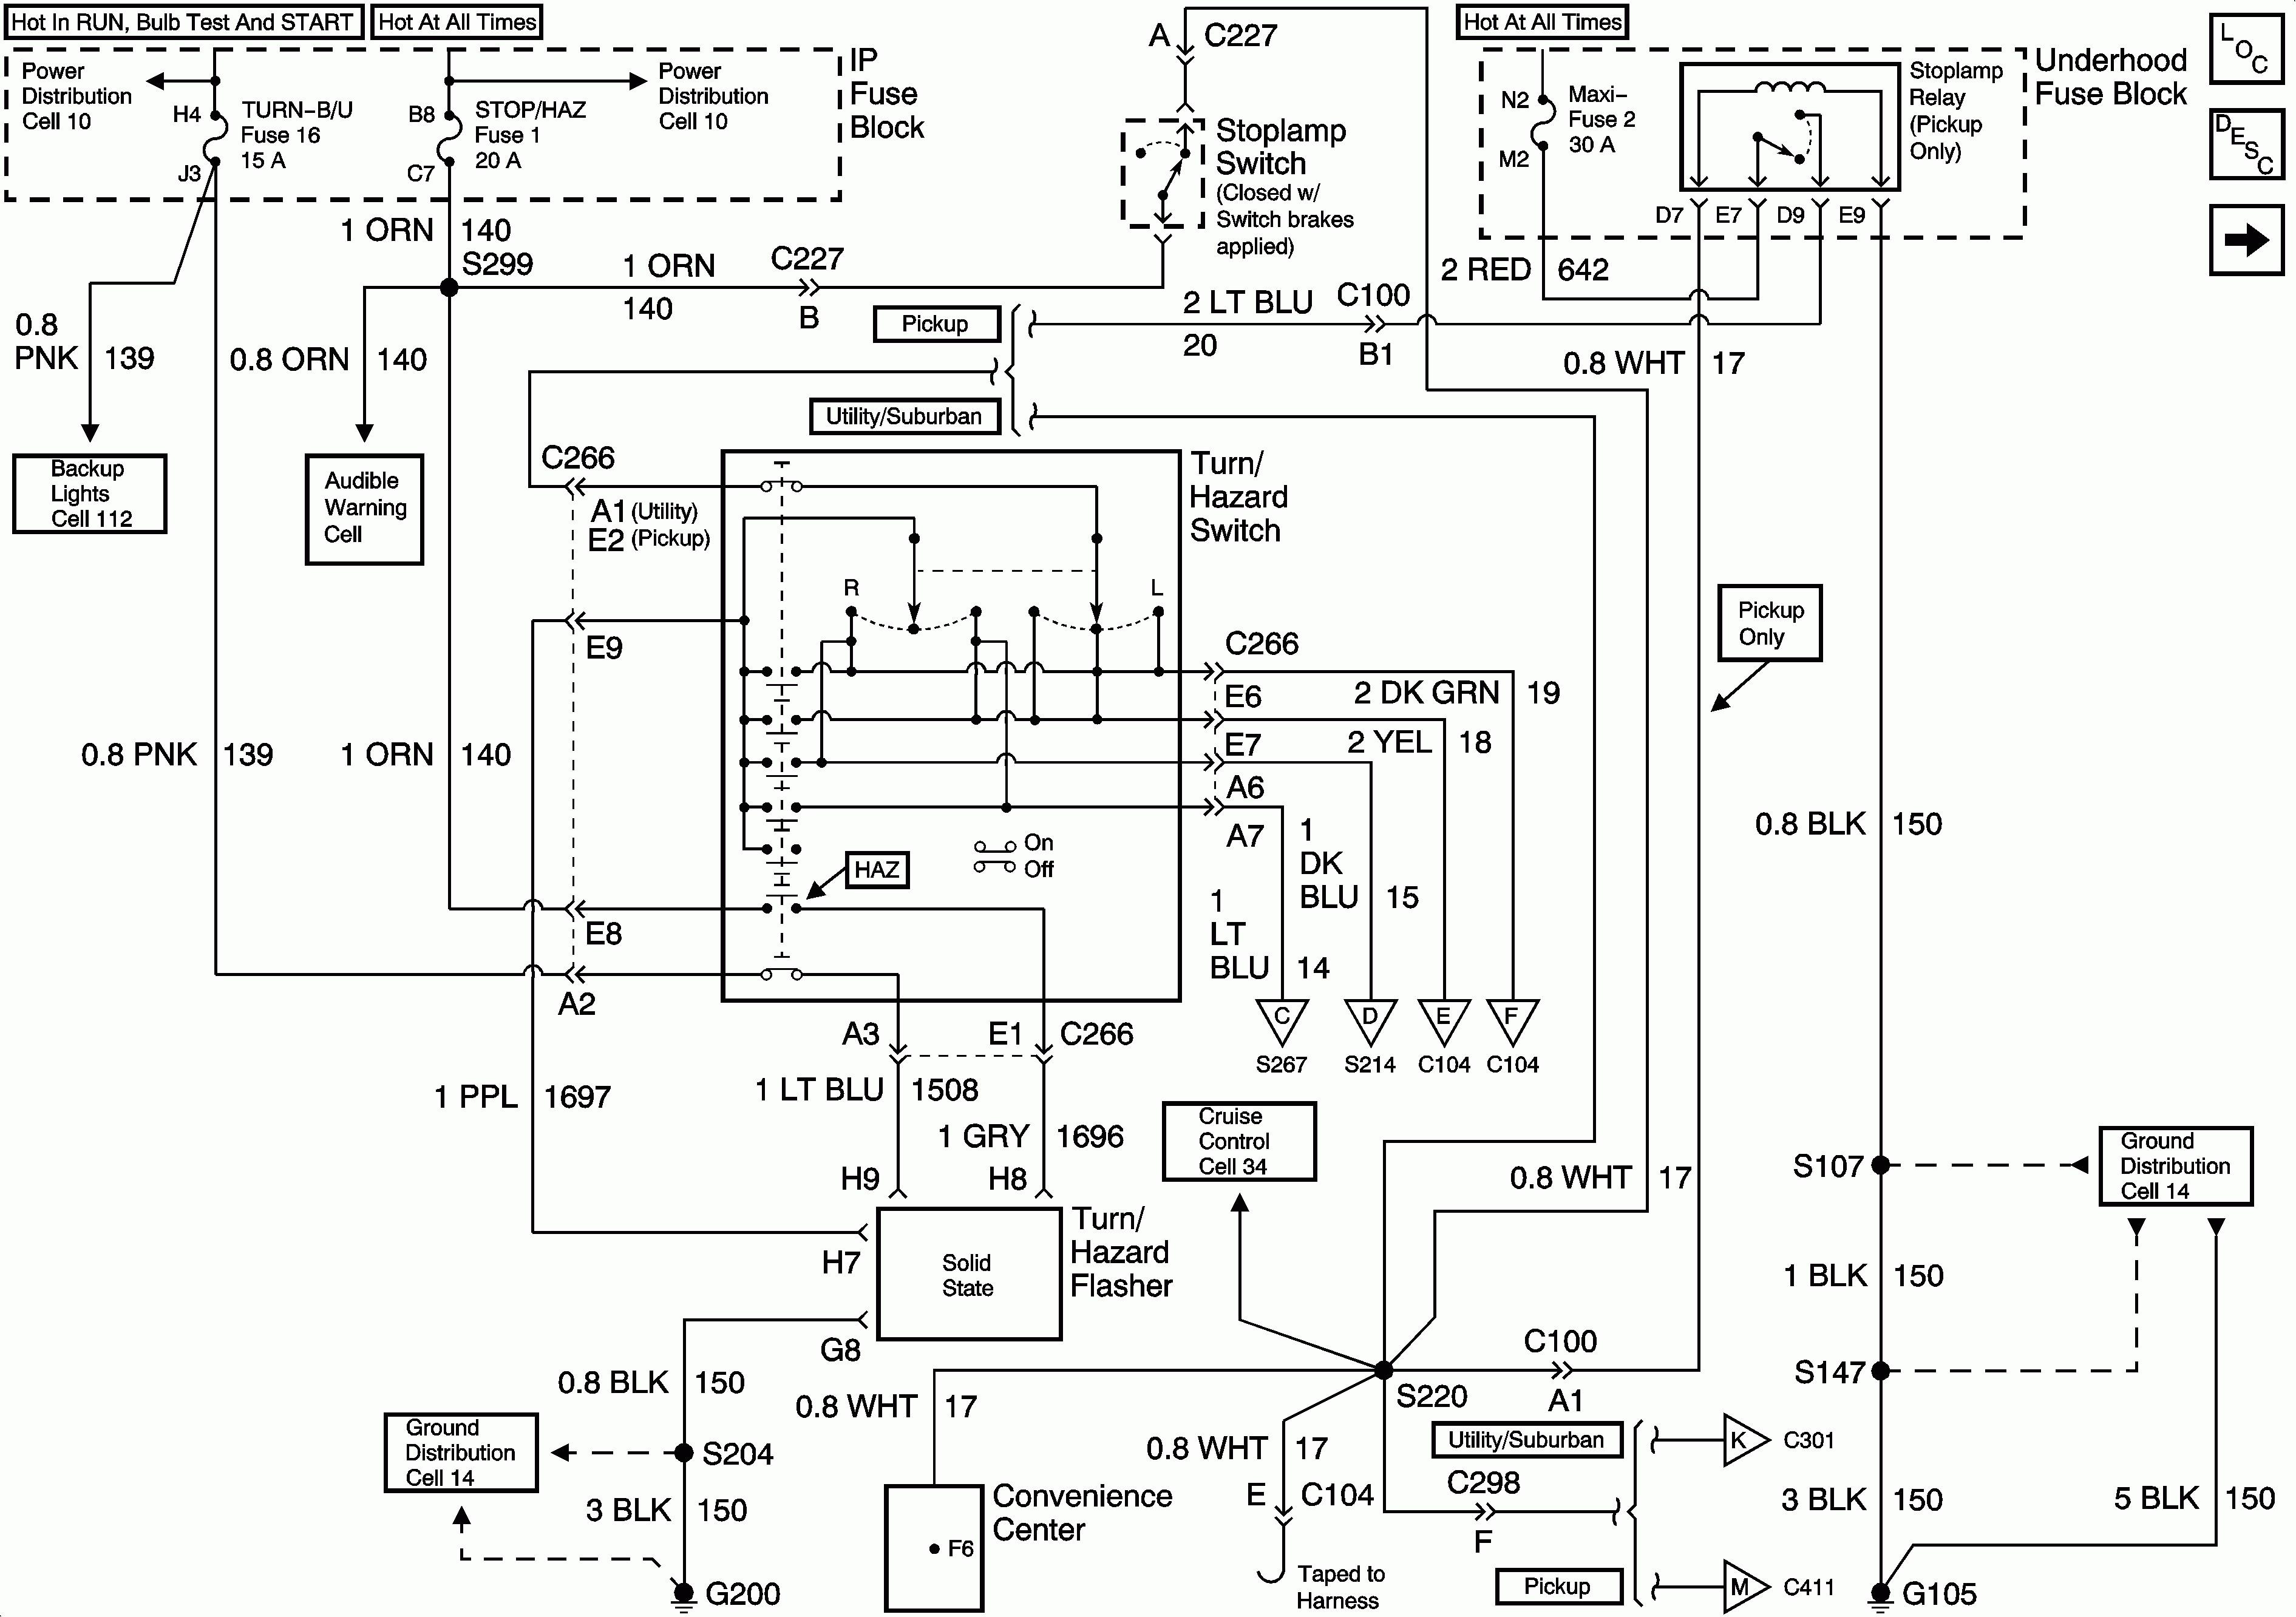 1999 suburban wiring diagram baldor motor diagrams single phase 93 schematic library